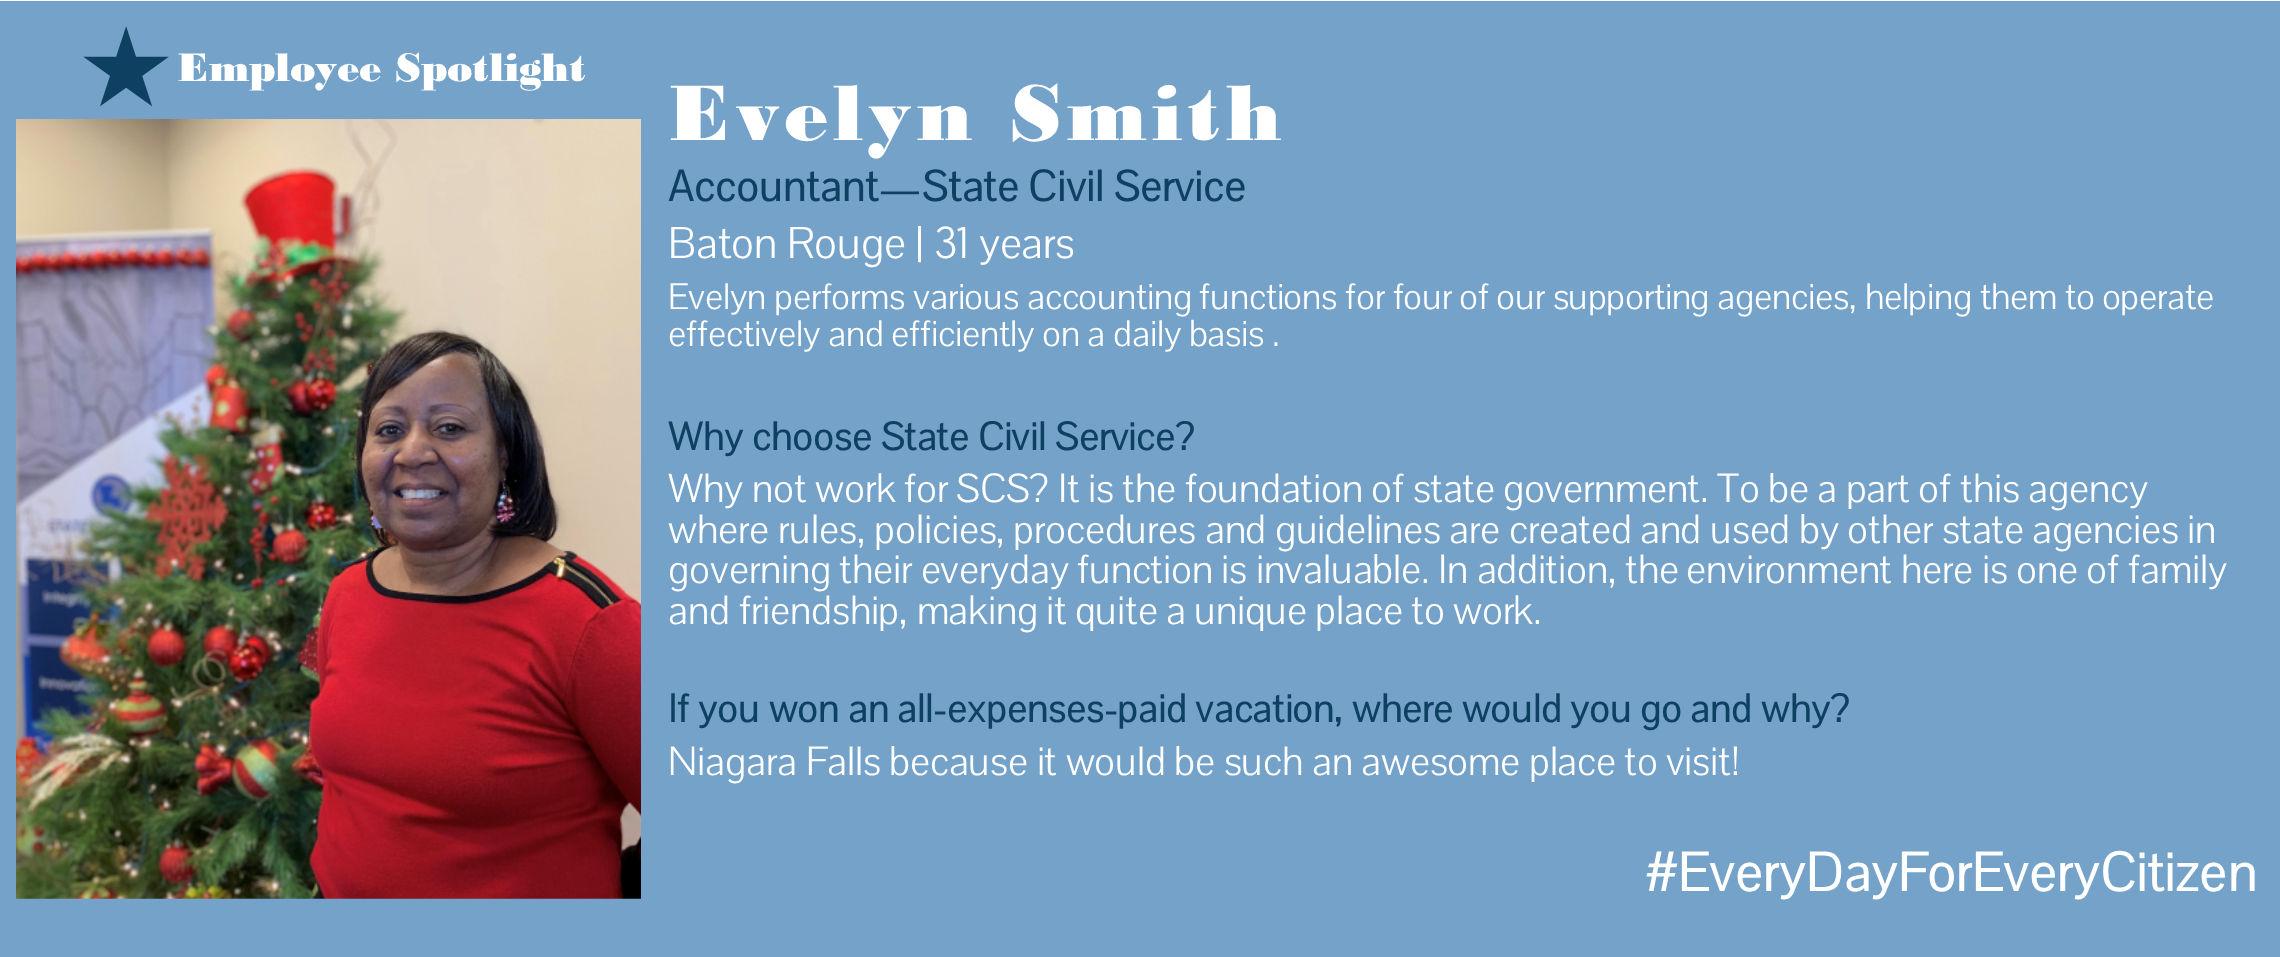 Louisiana Department of State Civil Service